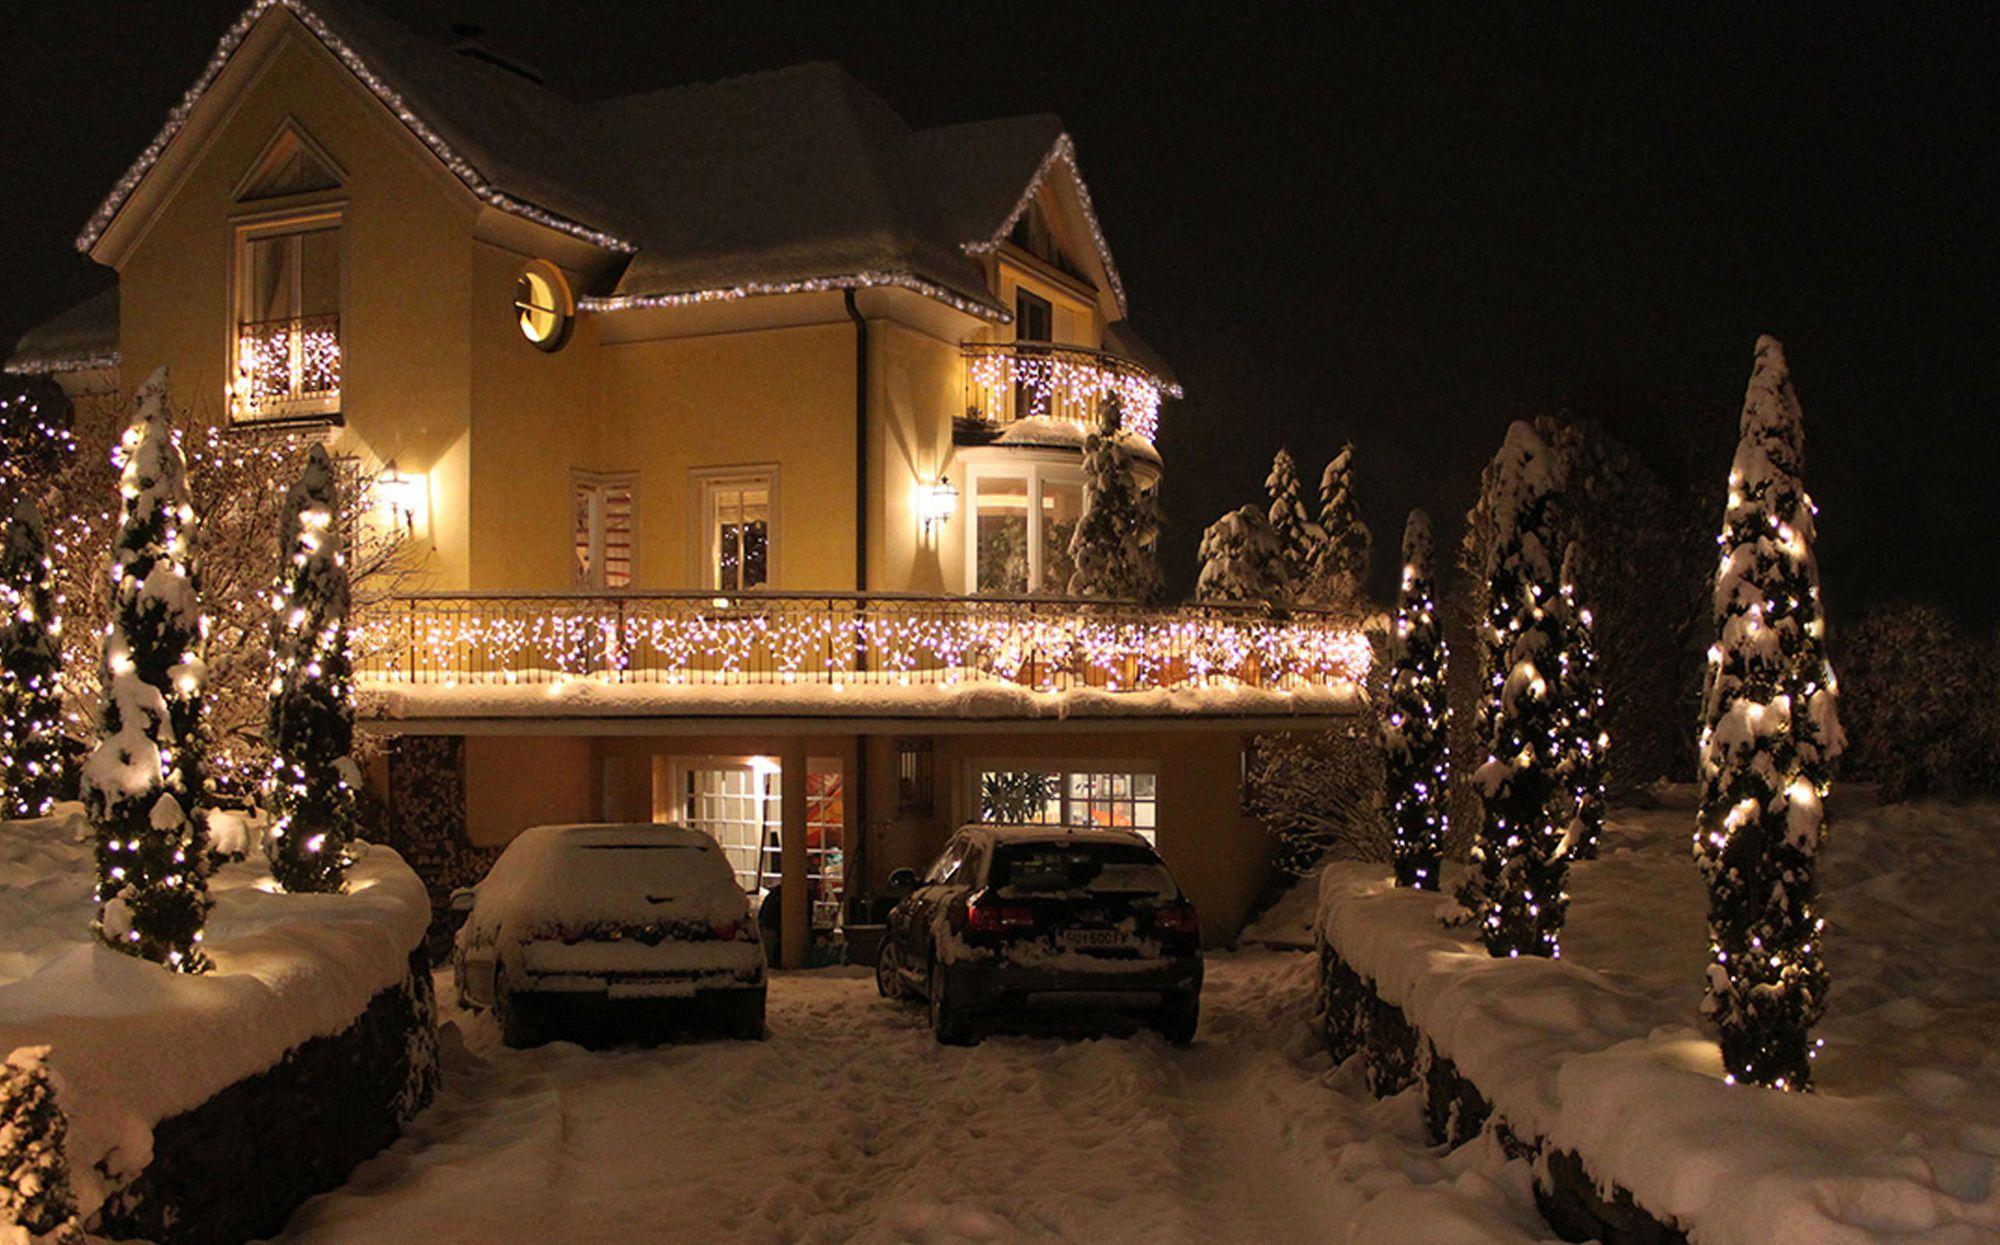 Haus Weihnachtsbeleuchtung.Haus Garten Baum